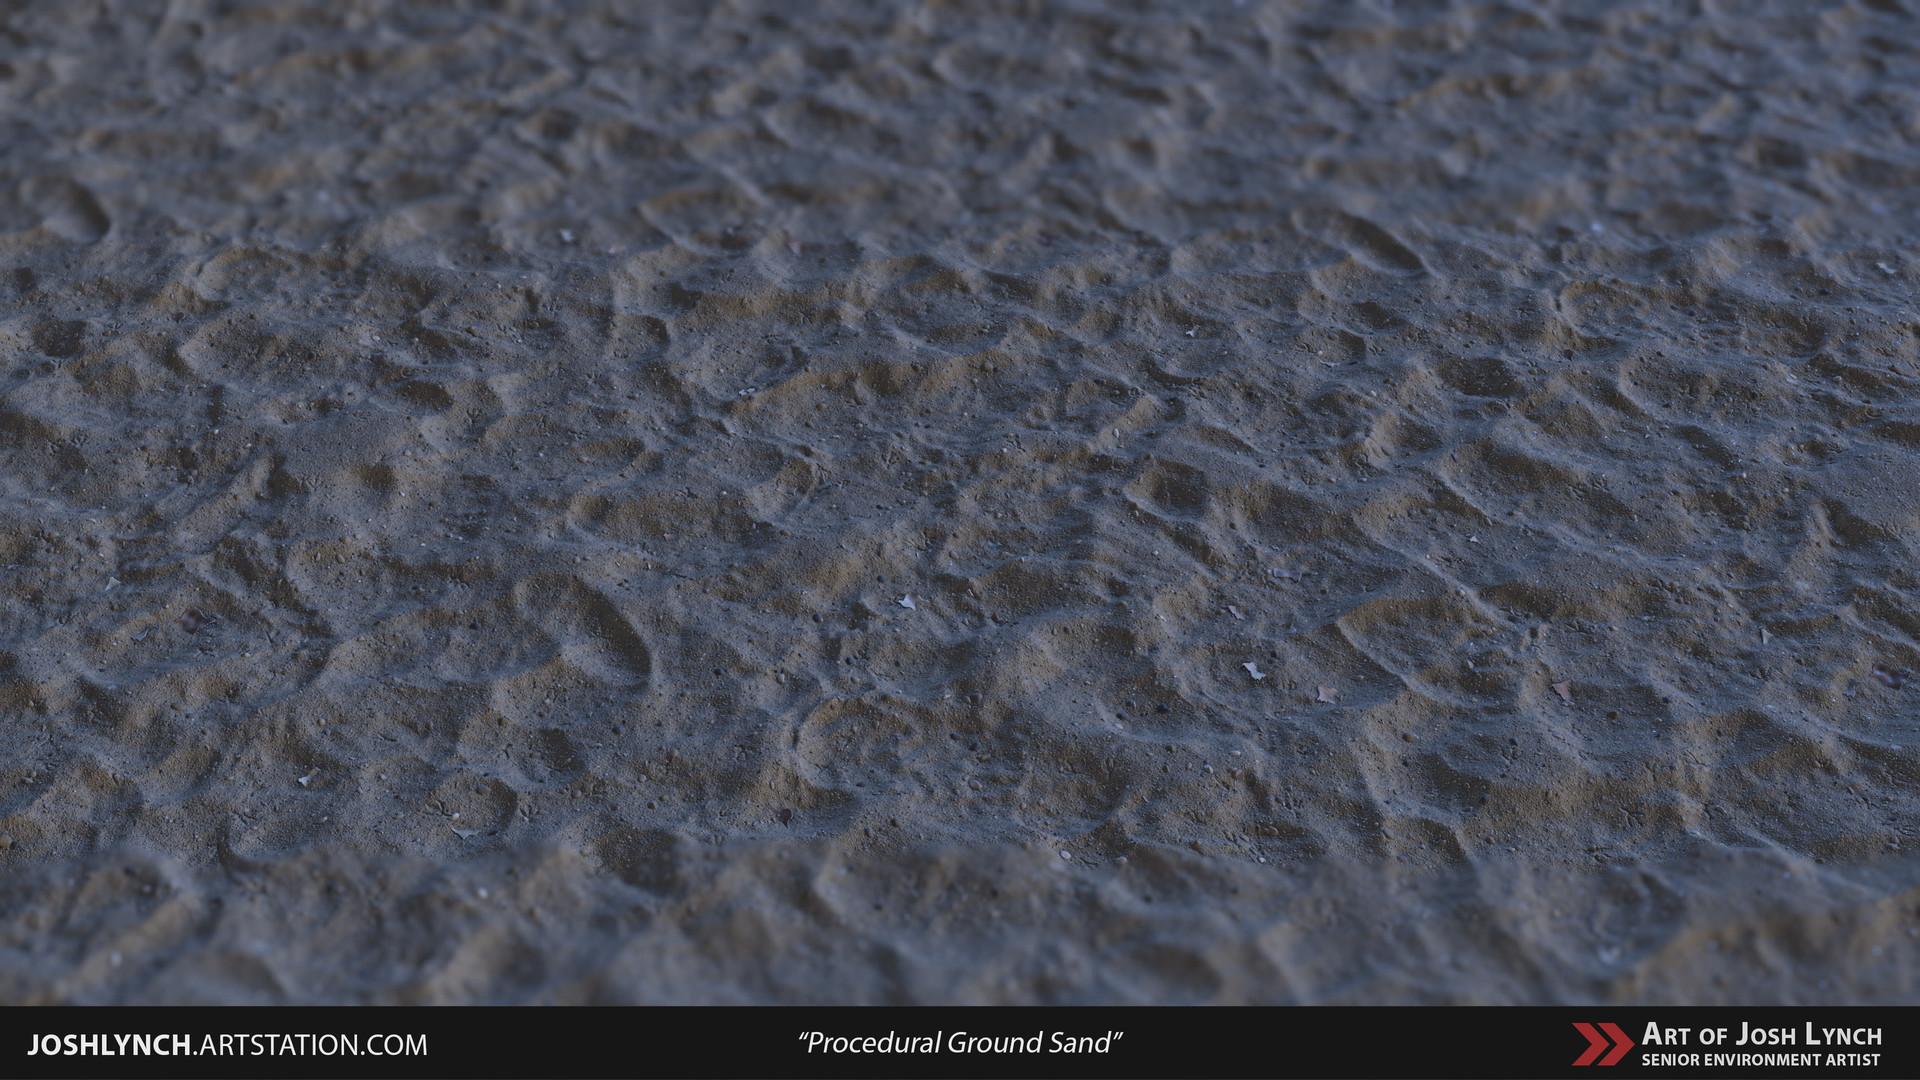 Joshua lynch white sand 01 layout comp ground 03